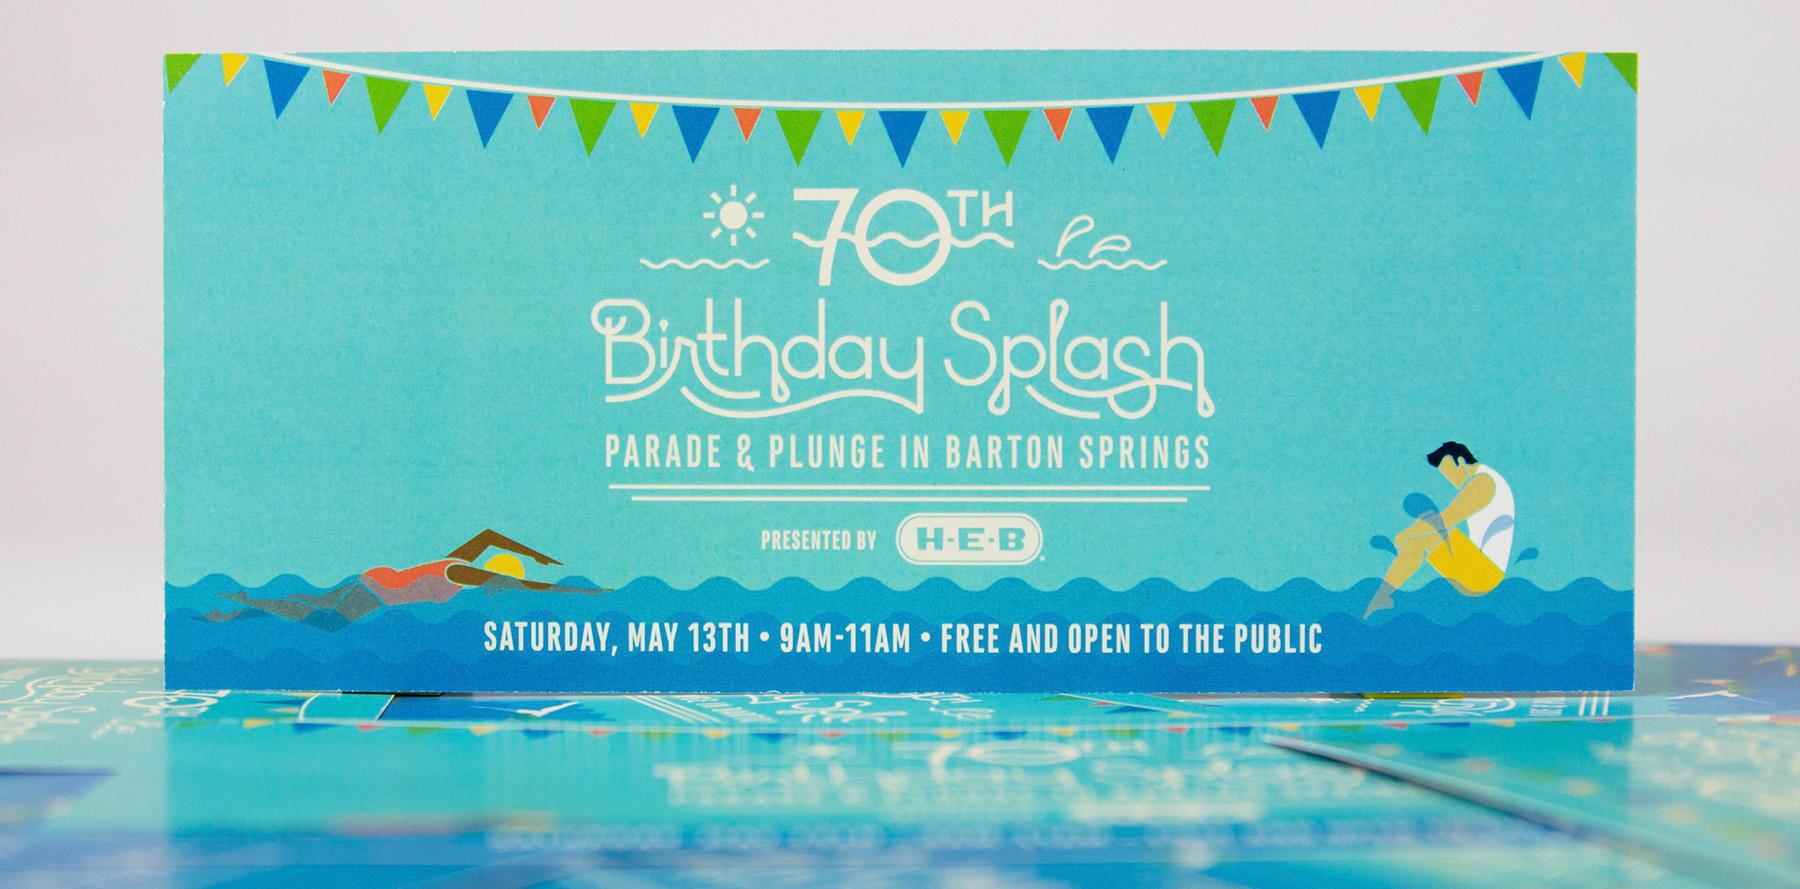 An invitation to Barton Springs Conservancy's 70th Birthday Splash.